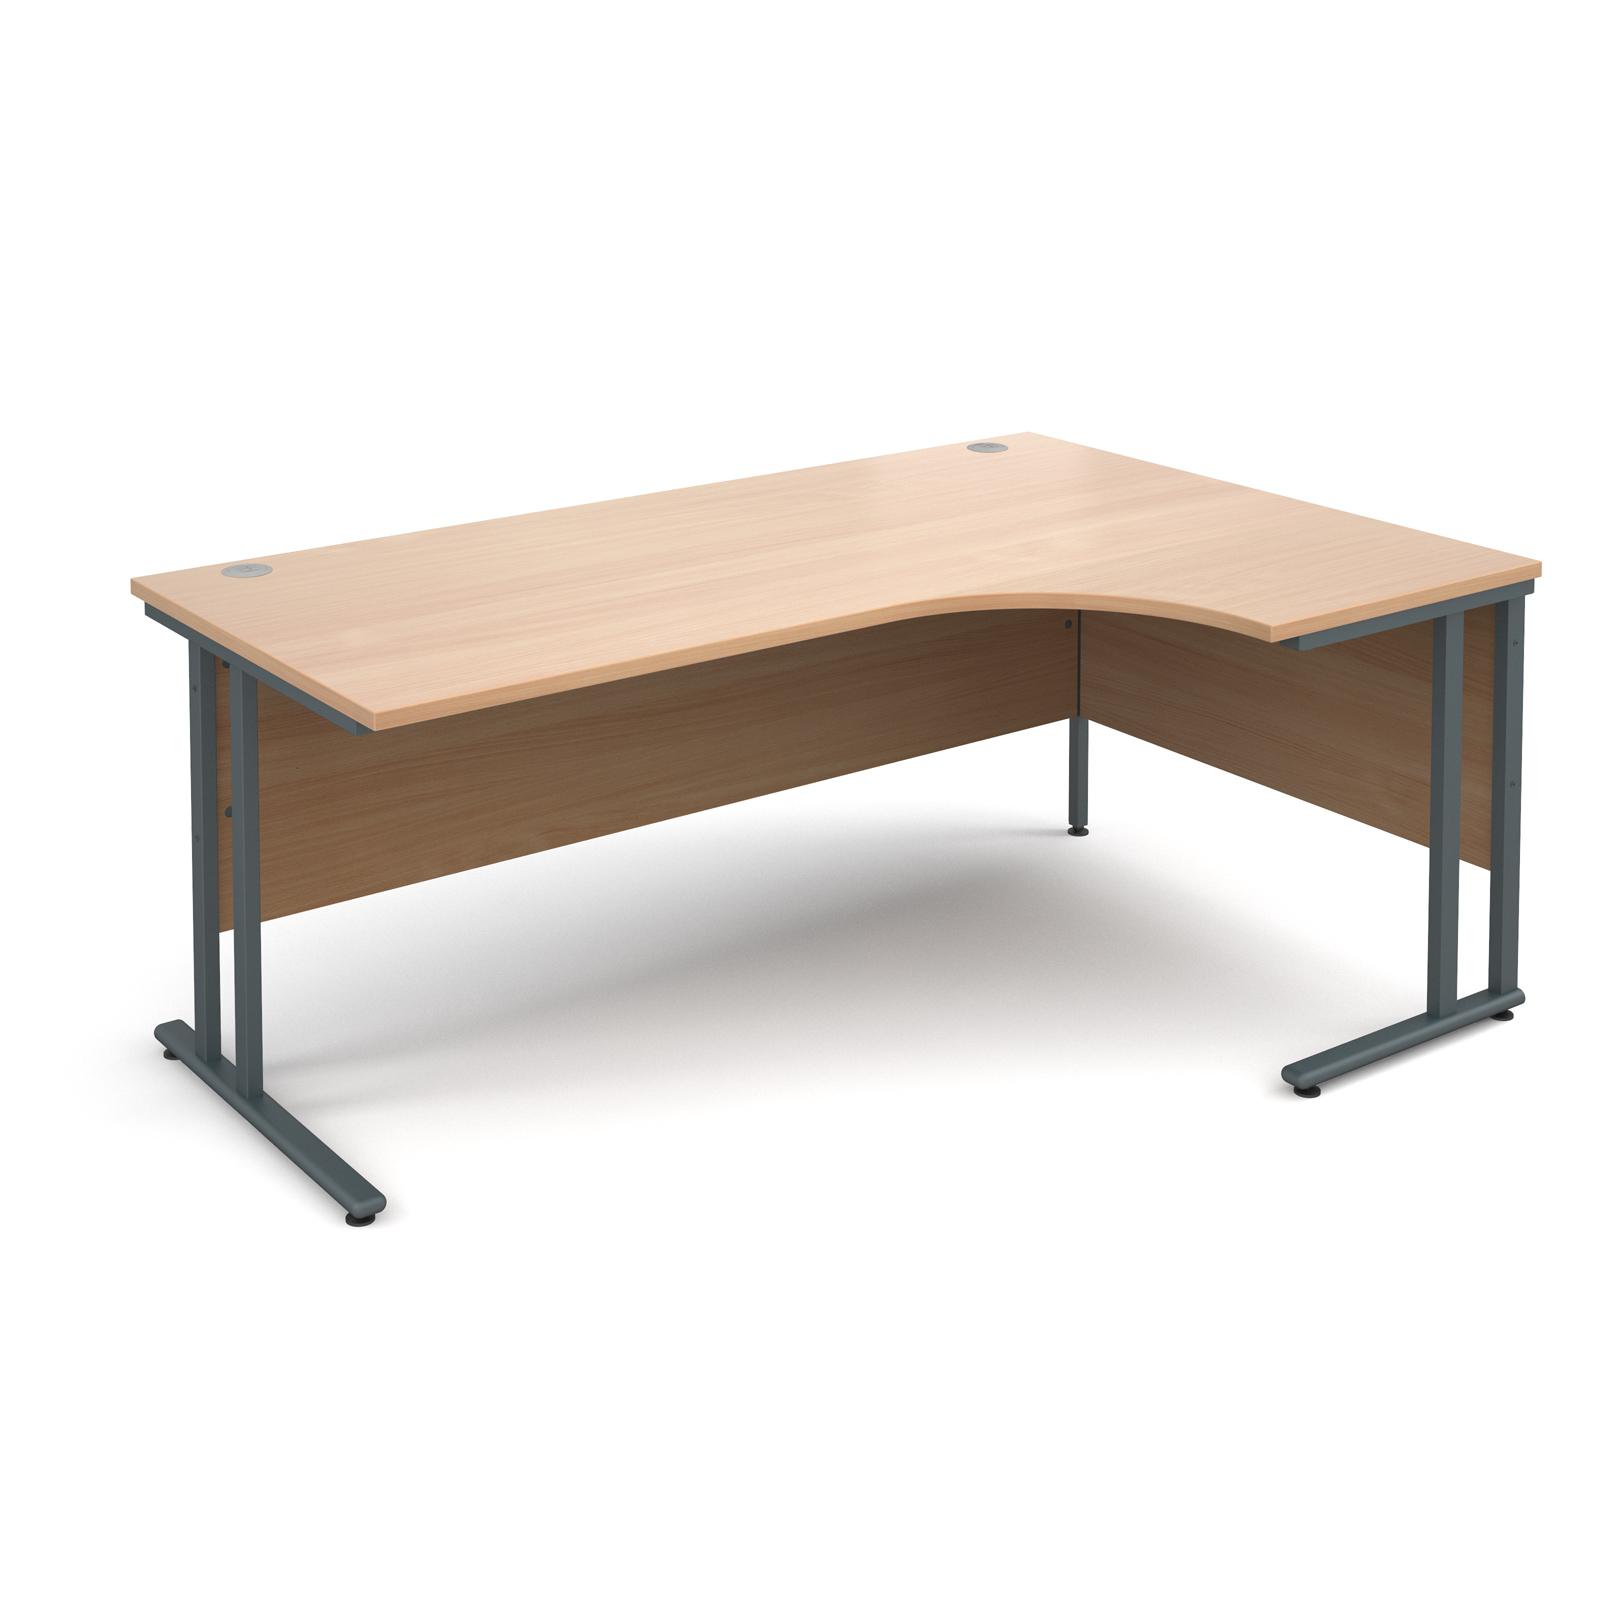 Maestro 25 Gl Right Hand Ergonomic Desk 1800mm Graphite Cantilever Frame Beech Top